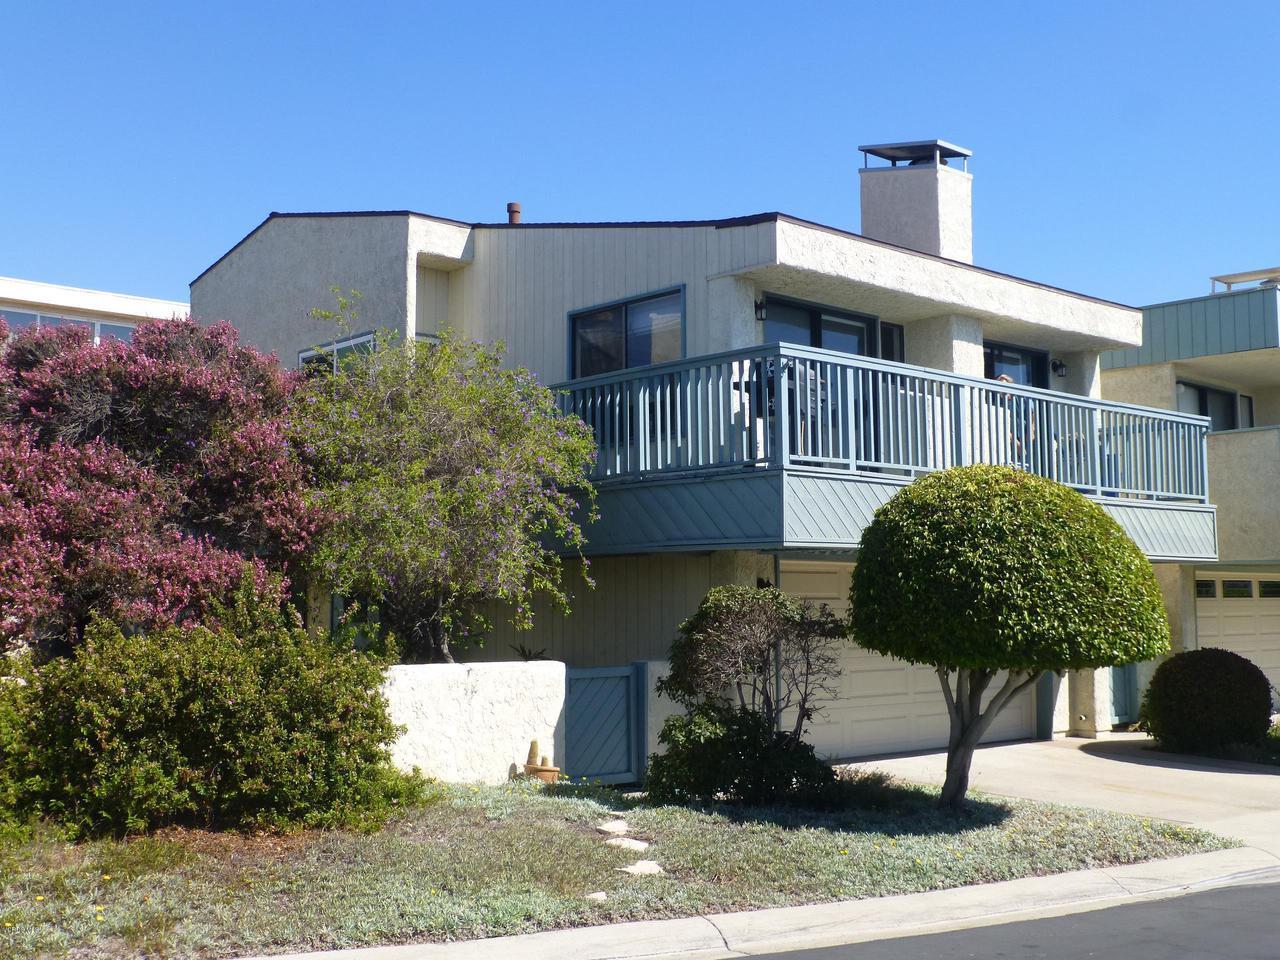 Photo of 248 WHITECAP Court, Port Hueneme, CA 93041